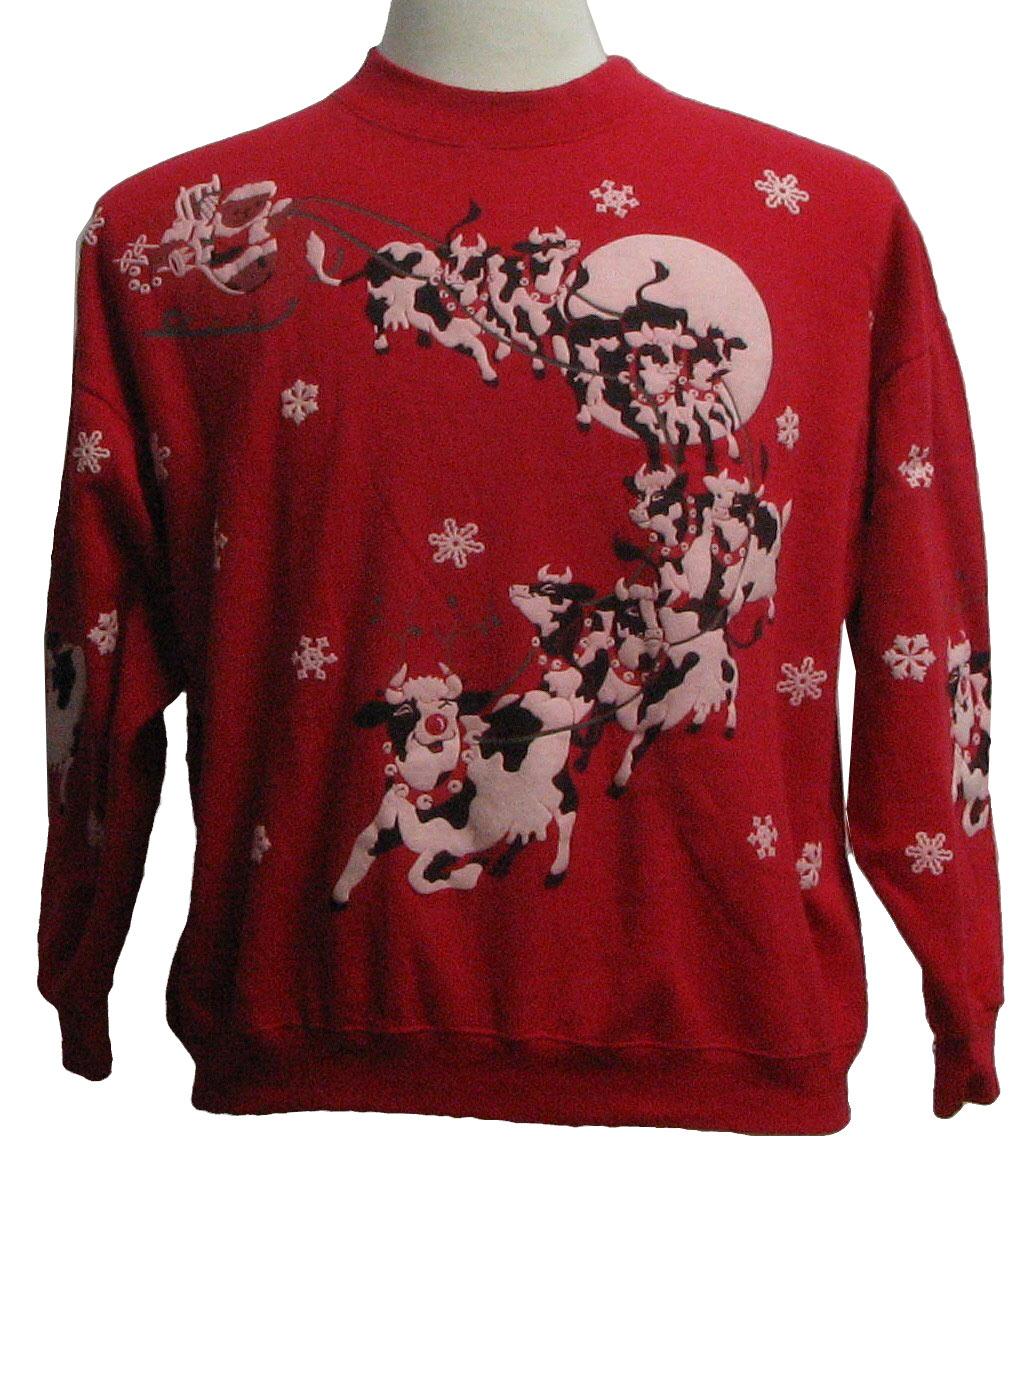 Vintage Spumoni 1980s Ugly Christmas Sweatshirt 80s Authentic